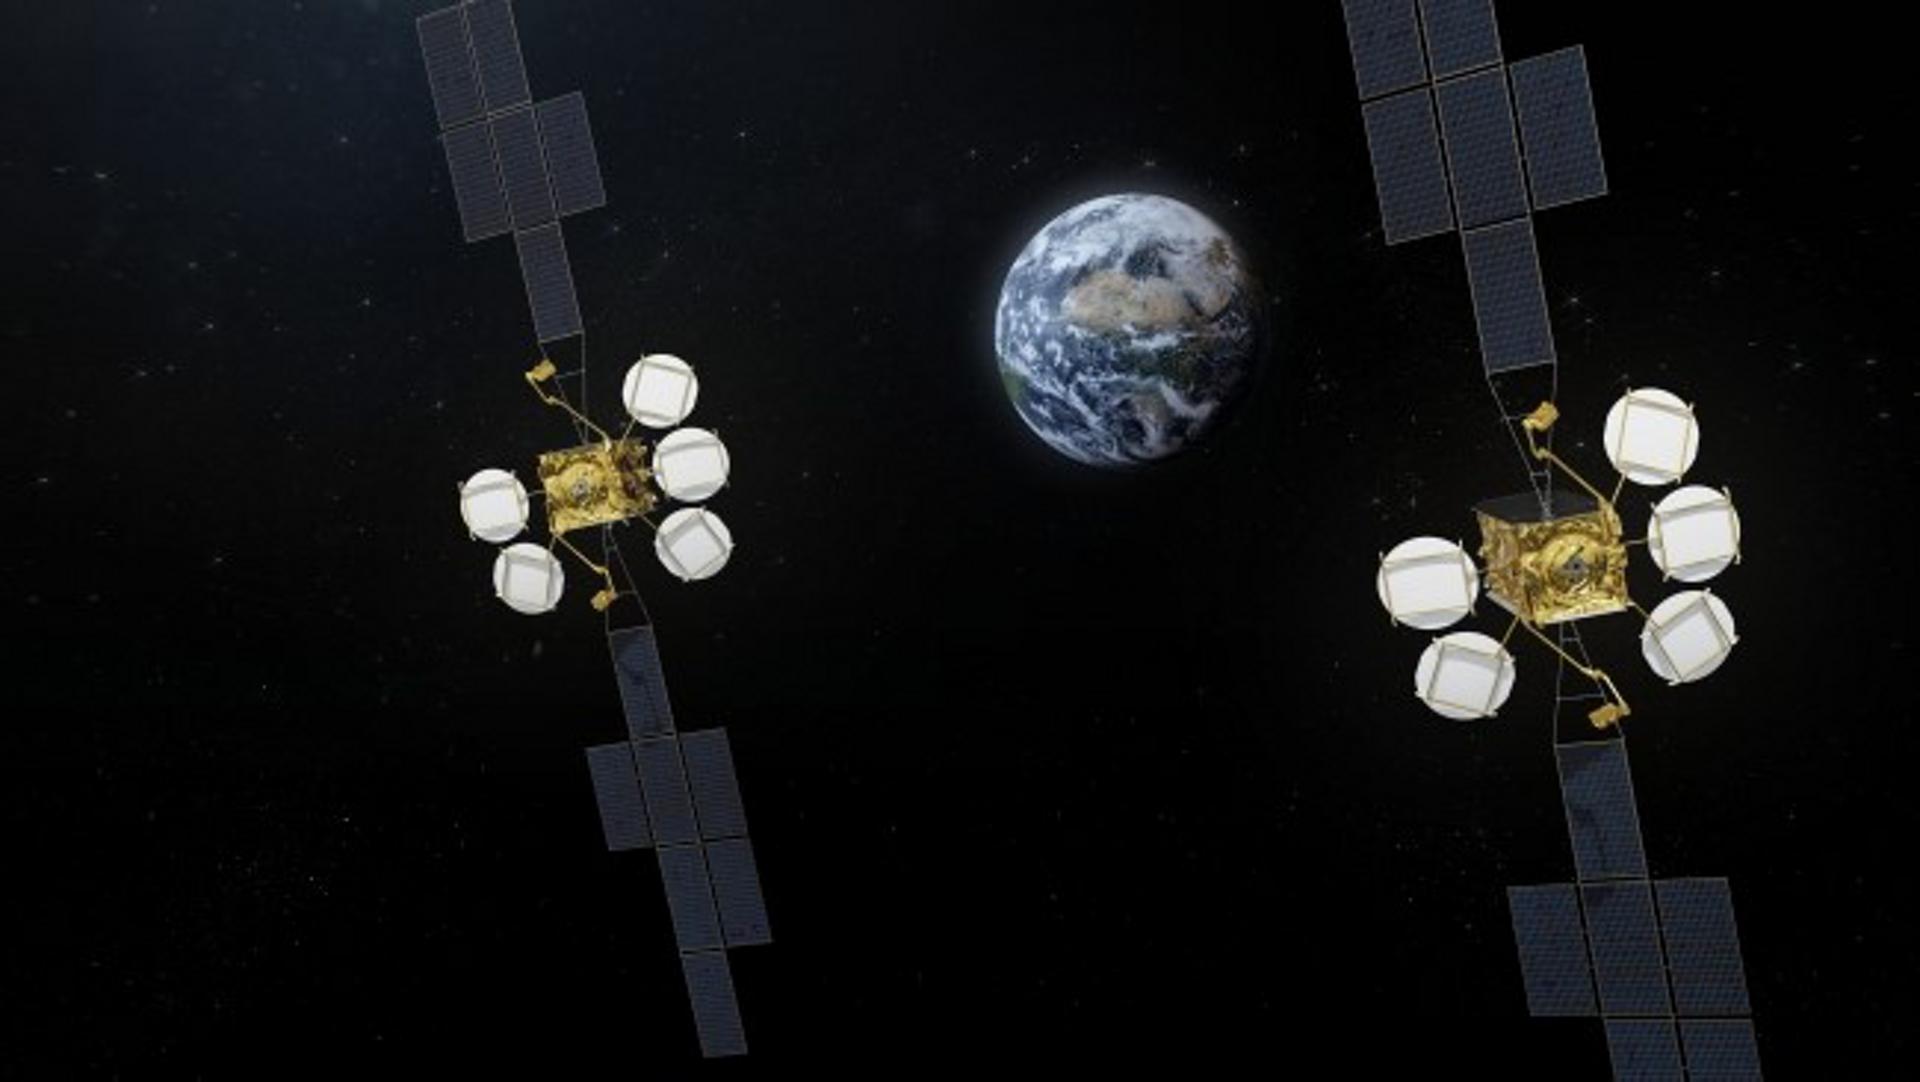 EOR on Eurostar satellites